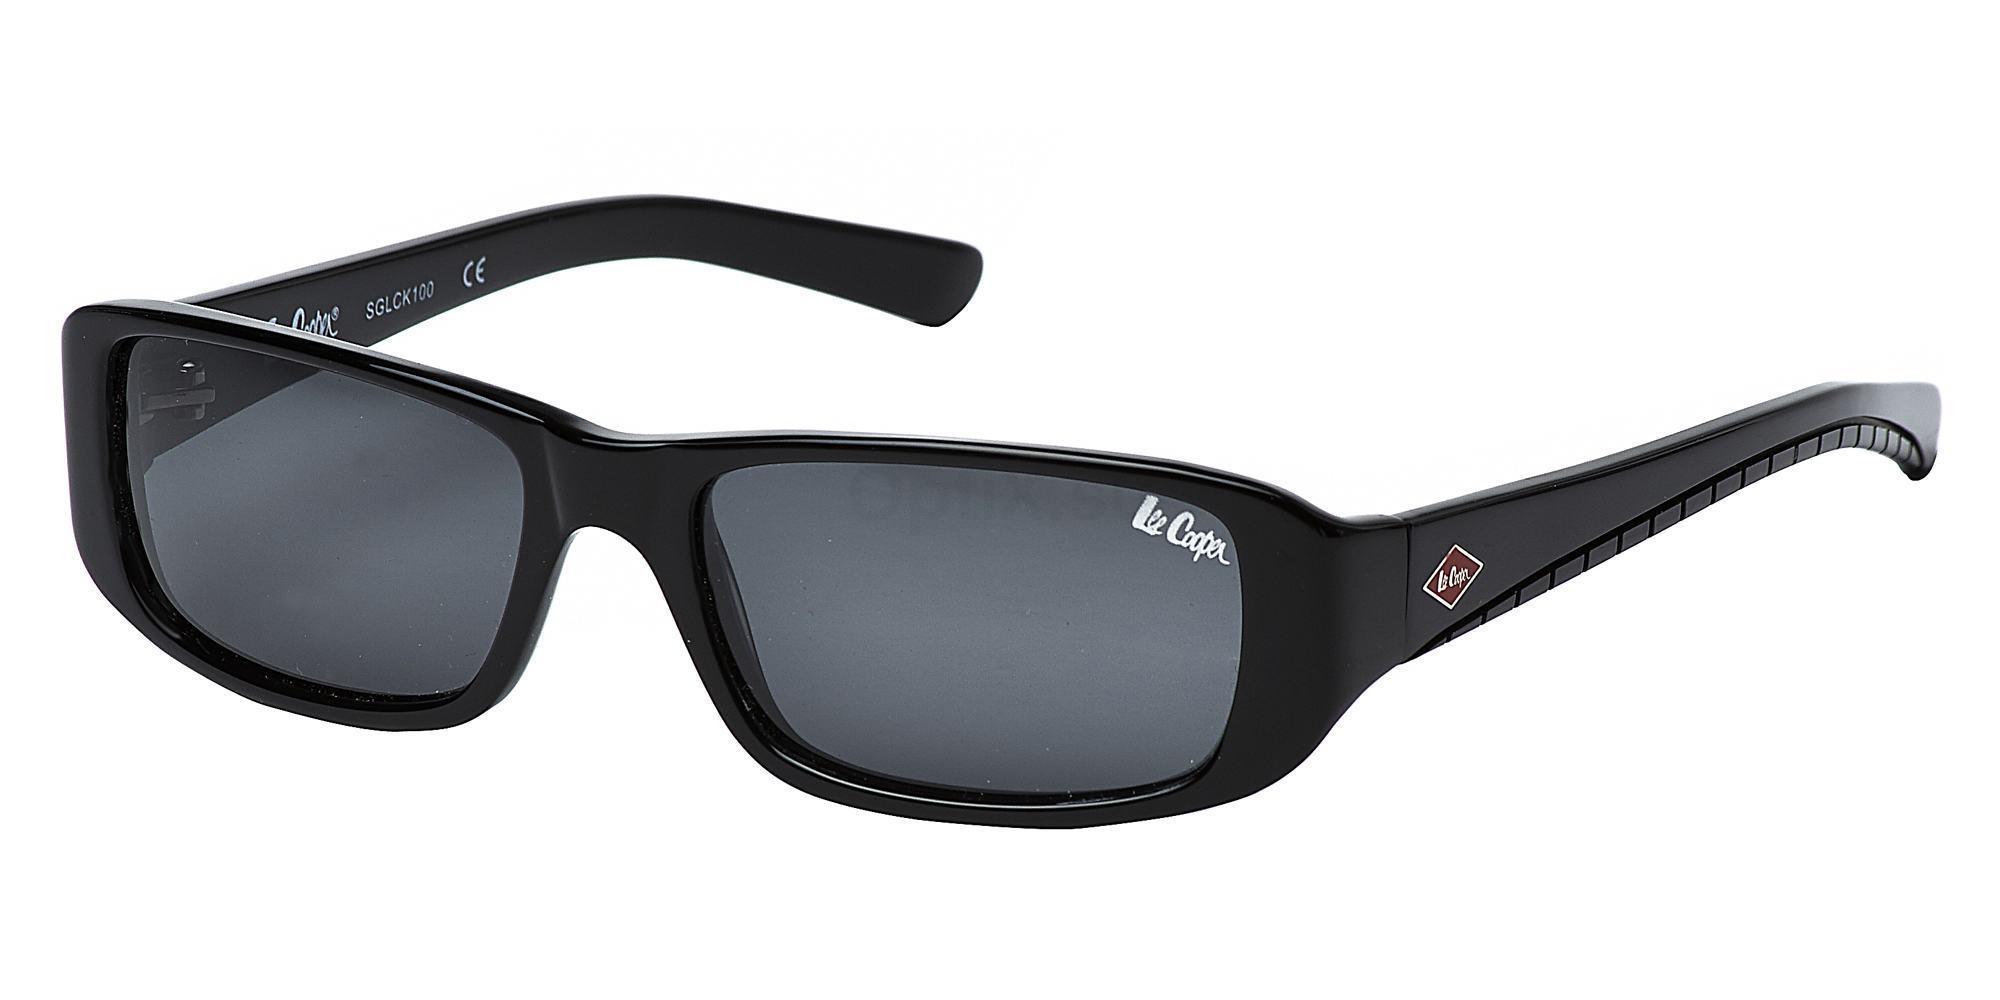 C1 SGLCK100 Sunglasses, Lee Cooper KIDS